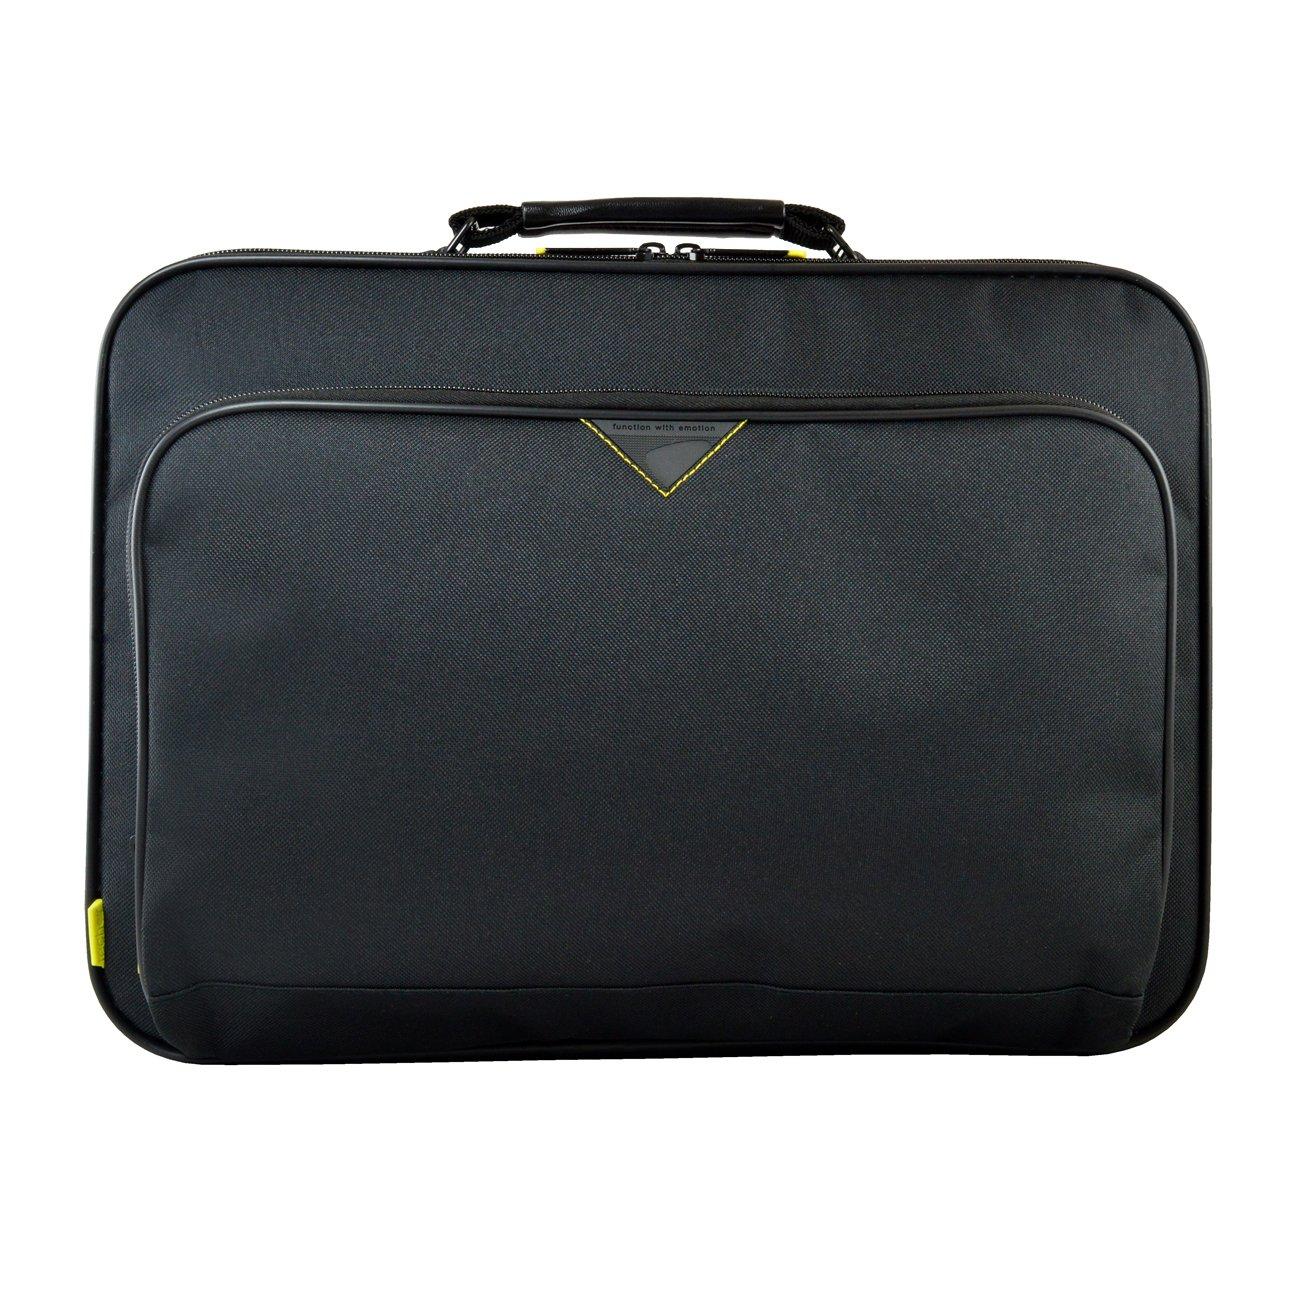 techair 11.6 inch Black Laptop Bag TANZ0105V6 Computer Peripheral Other Computer_Peripherals Tech Air